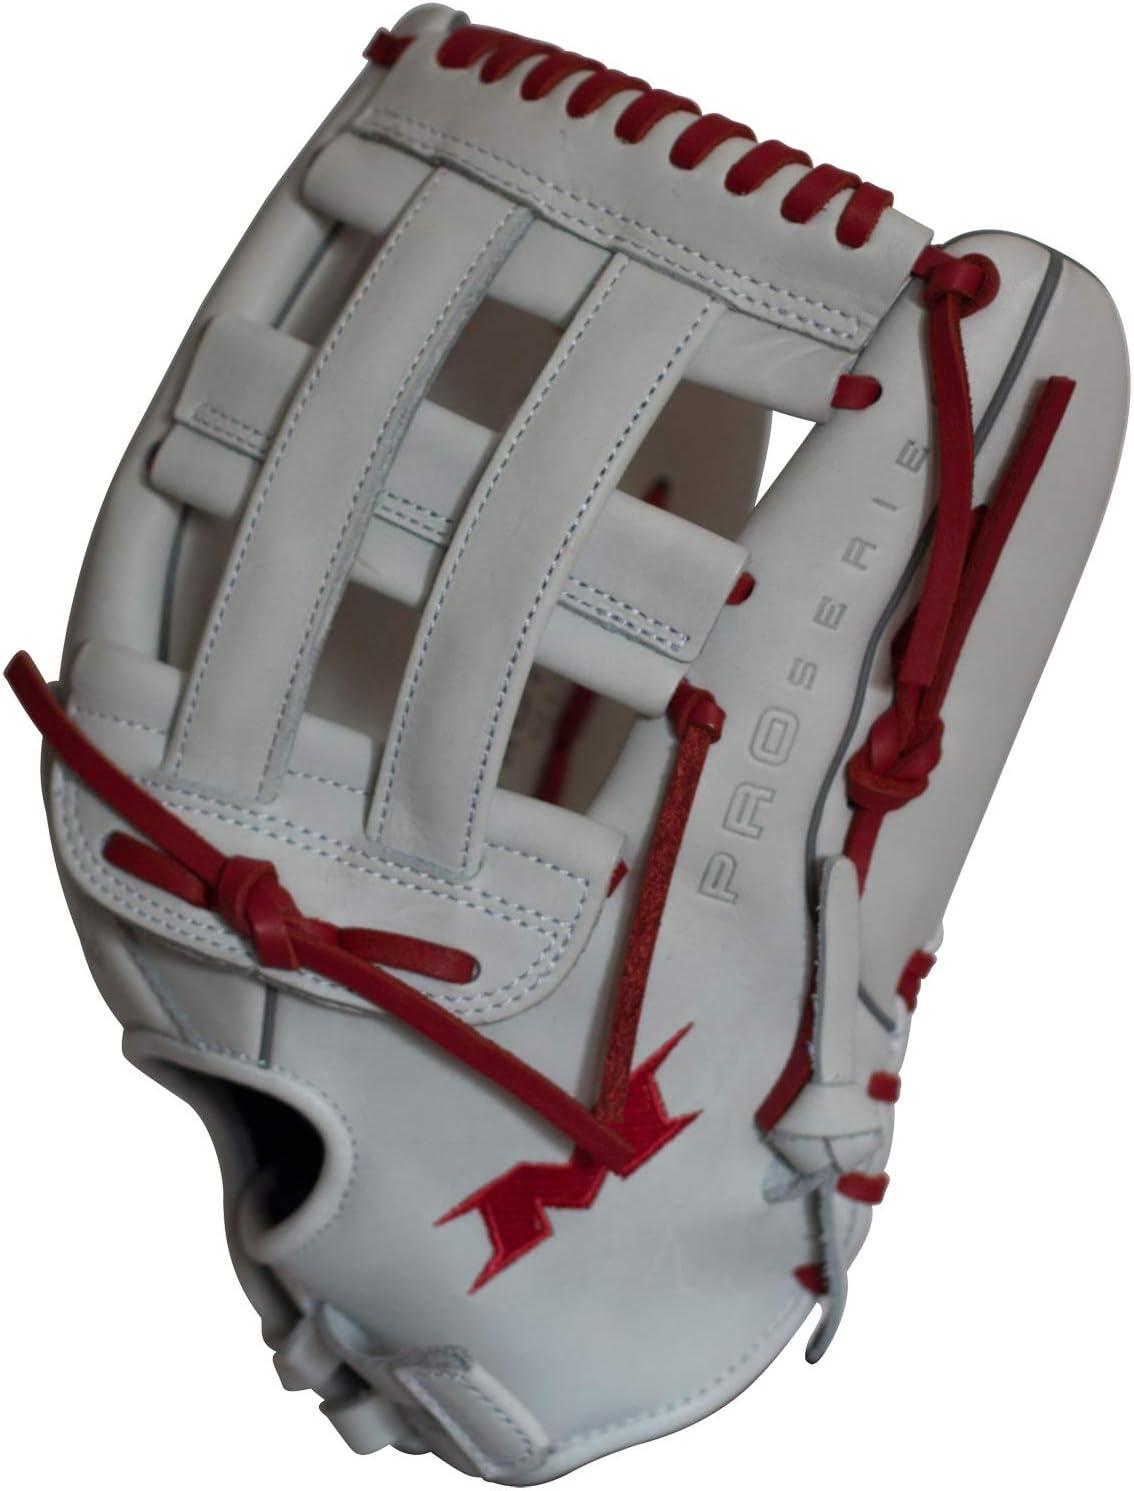 Miken Pro Series Slowpitch Softball Glove